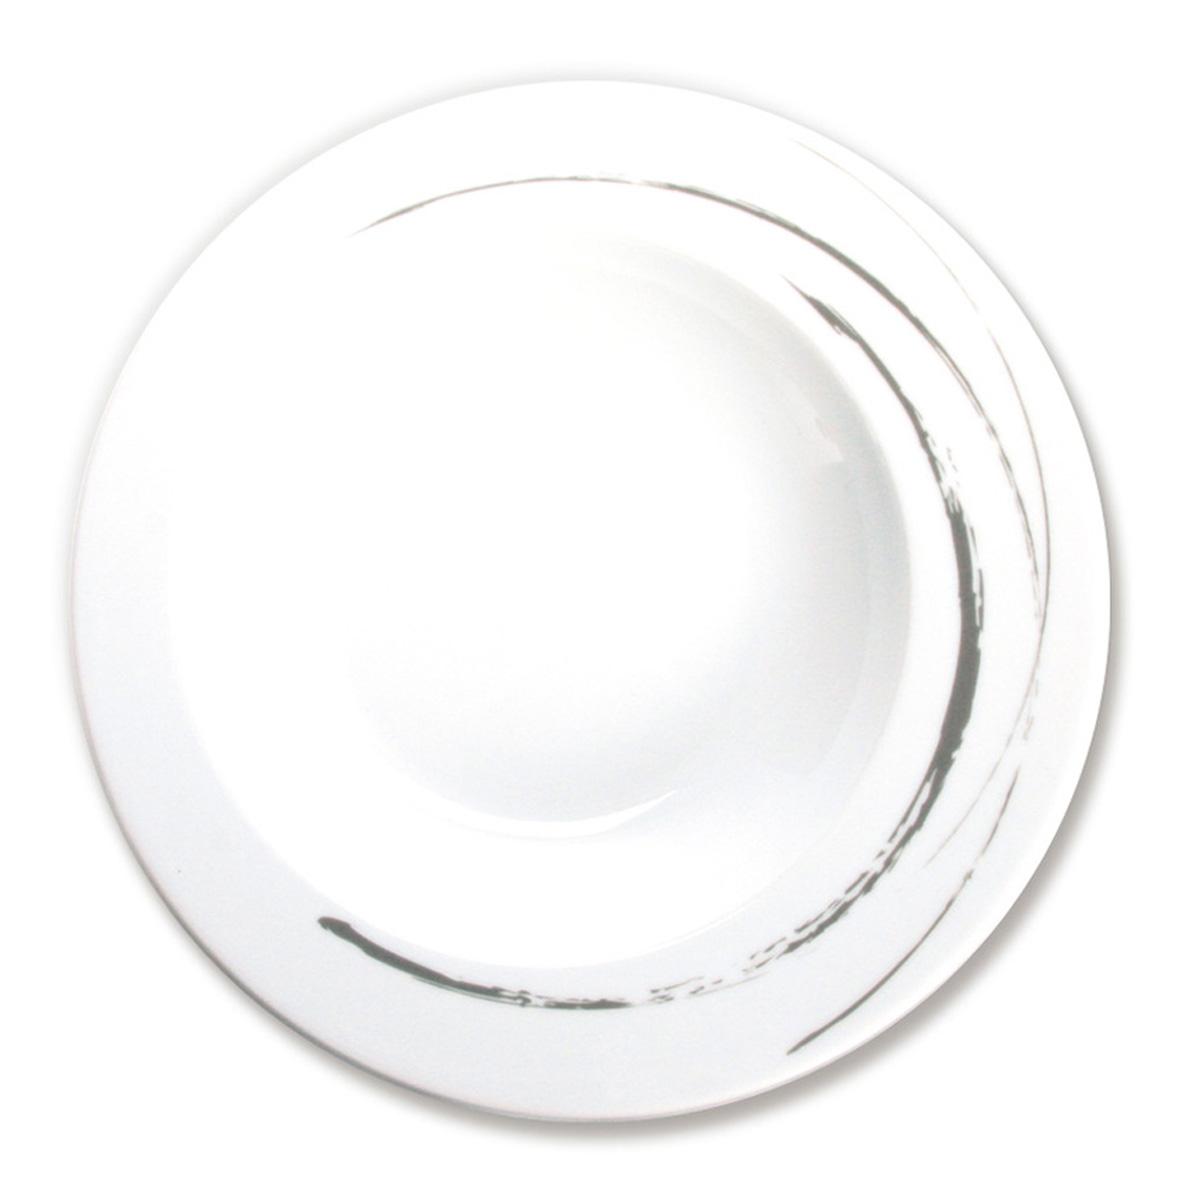 assiette creuse en porcelaine blanche vaisselle moderne et chic. Black Bedroom Furniture Sets. Home Design Ideas